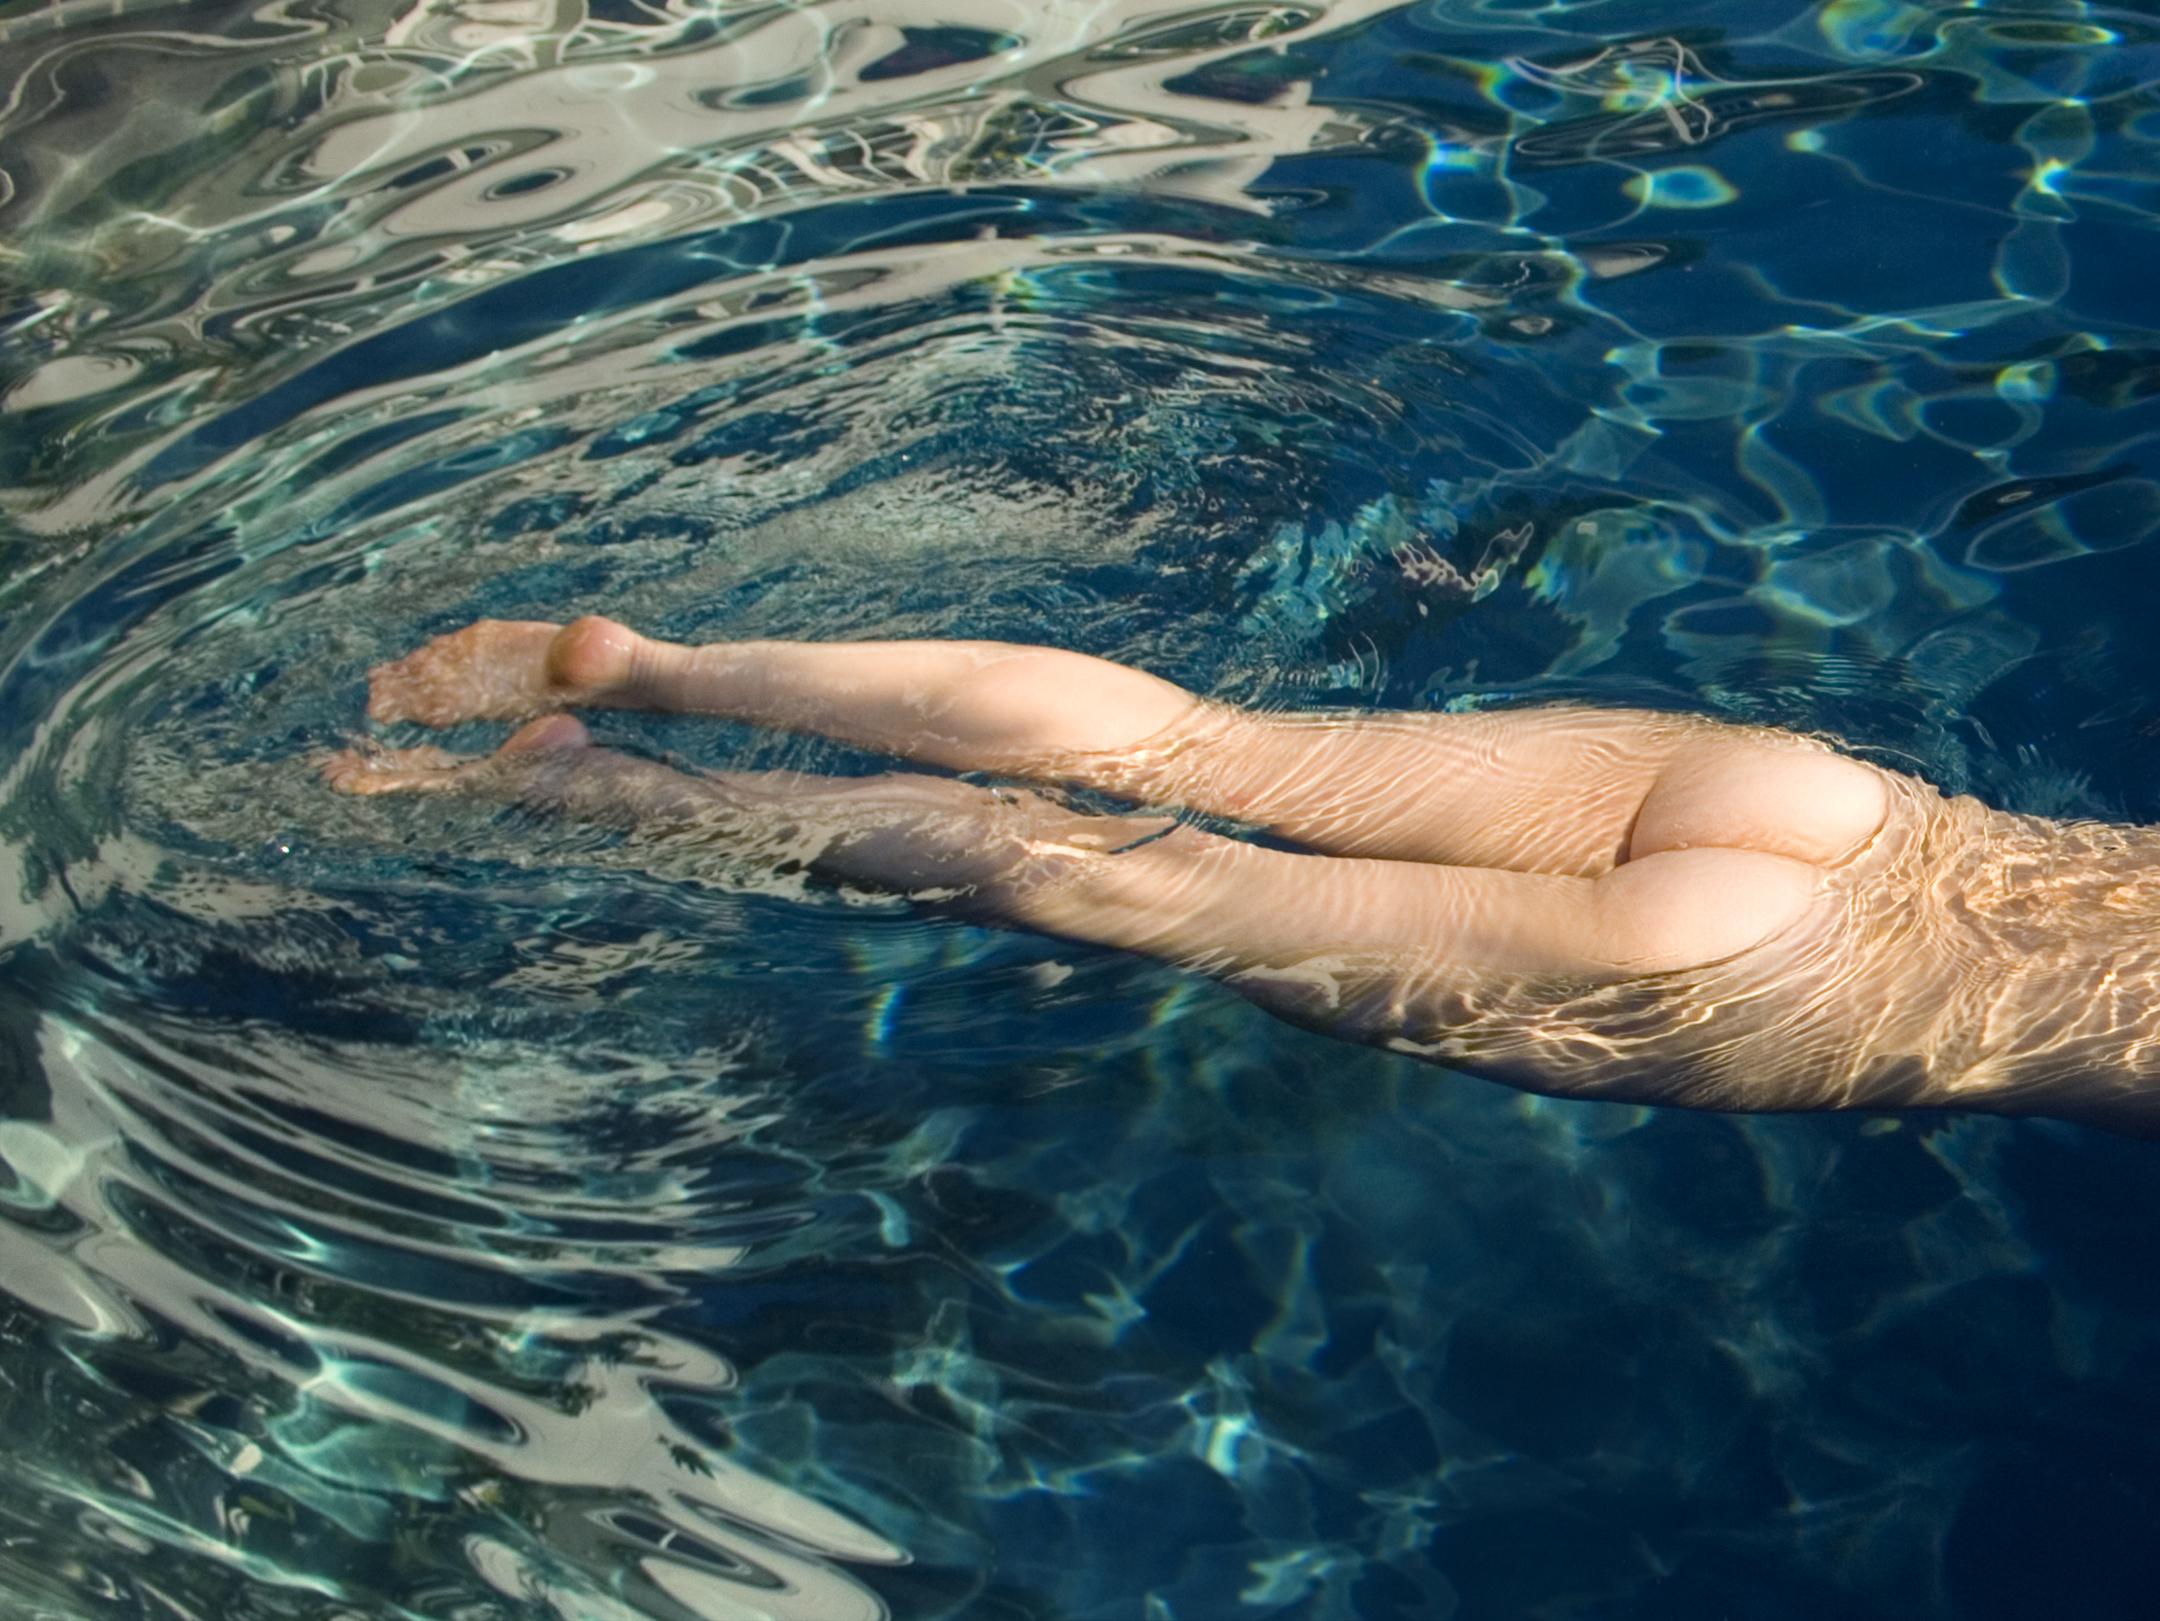 Nude woman floating in pool